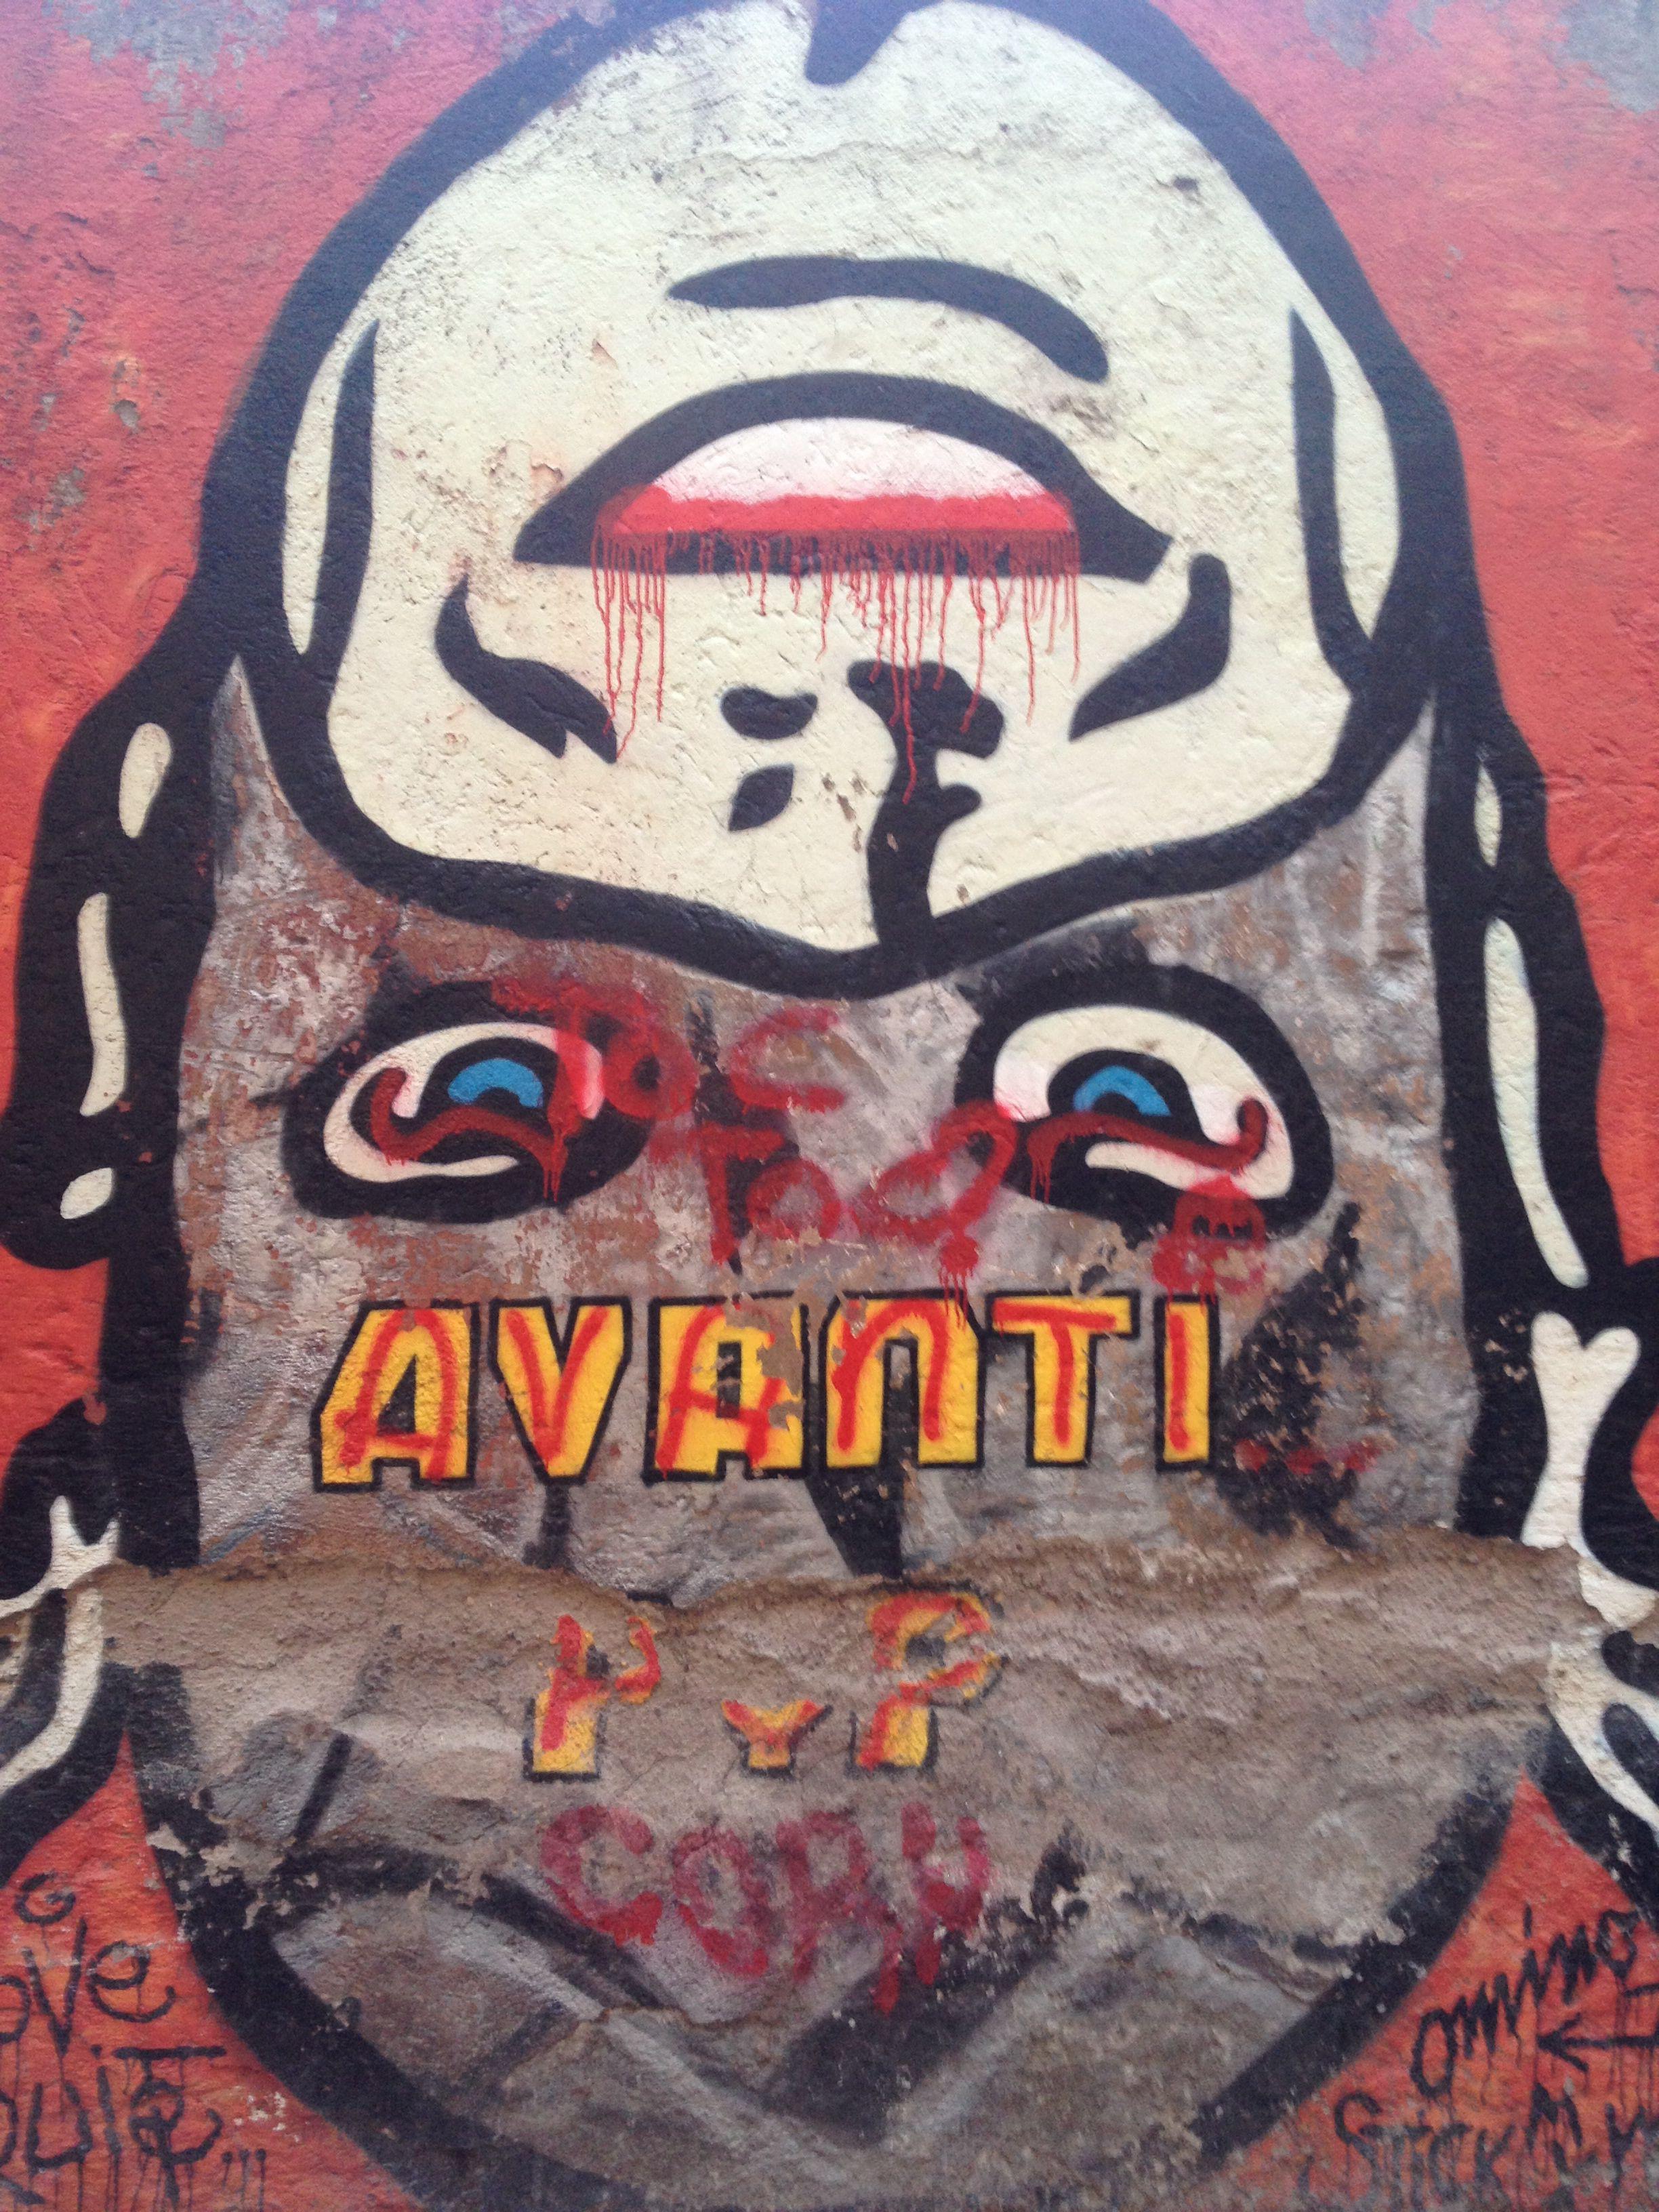 San lorenzo rome roma urban art graffiti